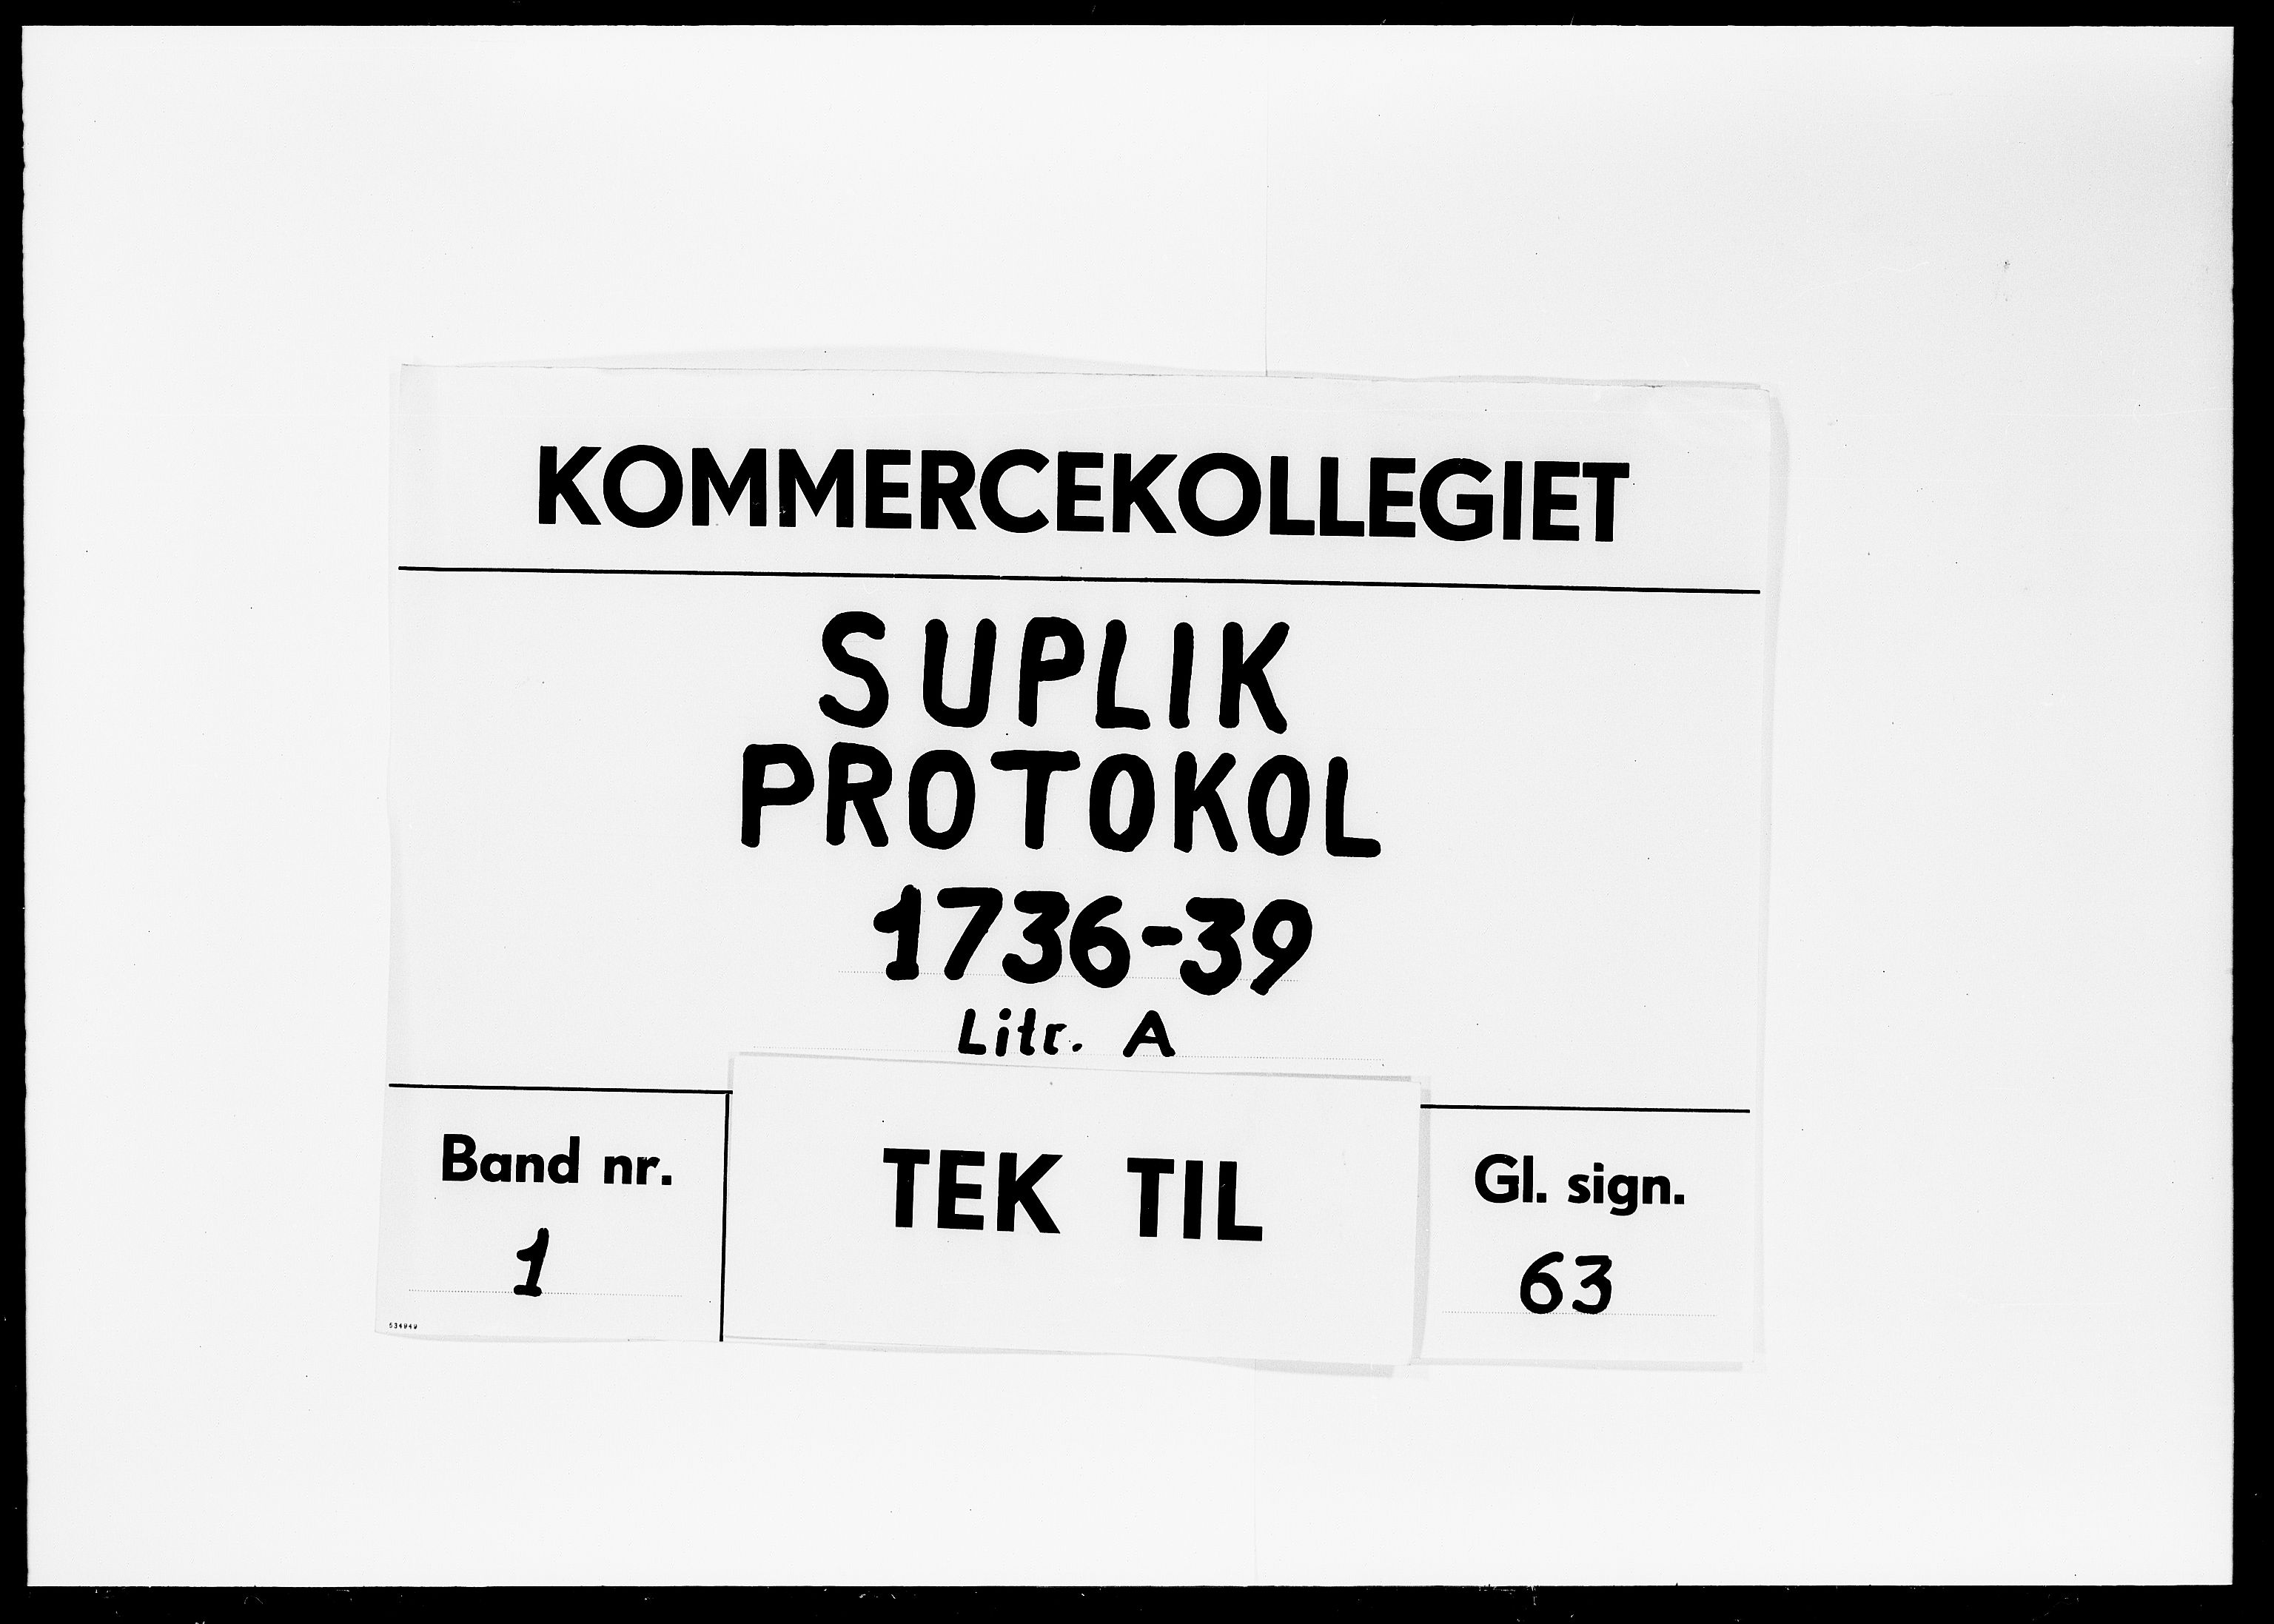 DRA, Kommercekollegiet, Dansk-Norske Sekretariat, -/31: Suplik Protokol A, 1736-1739